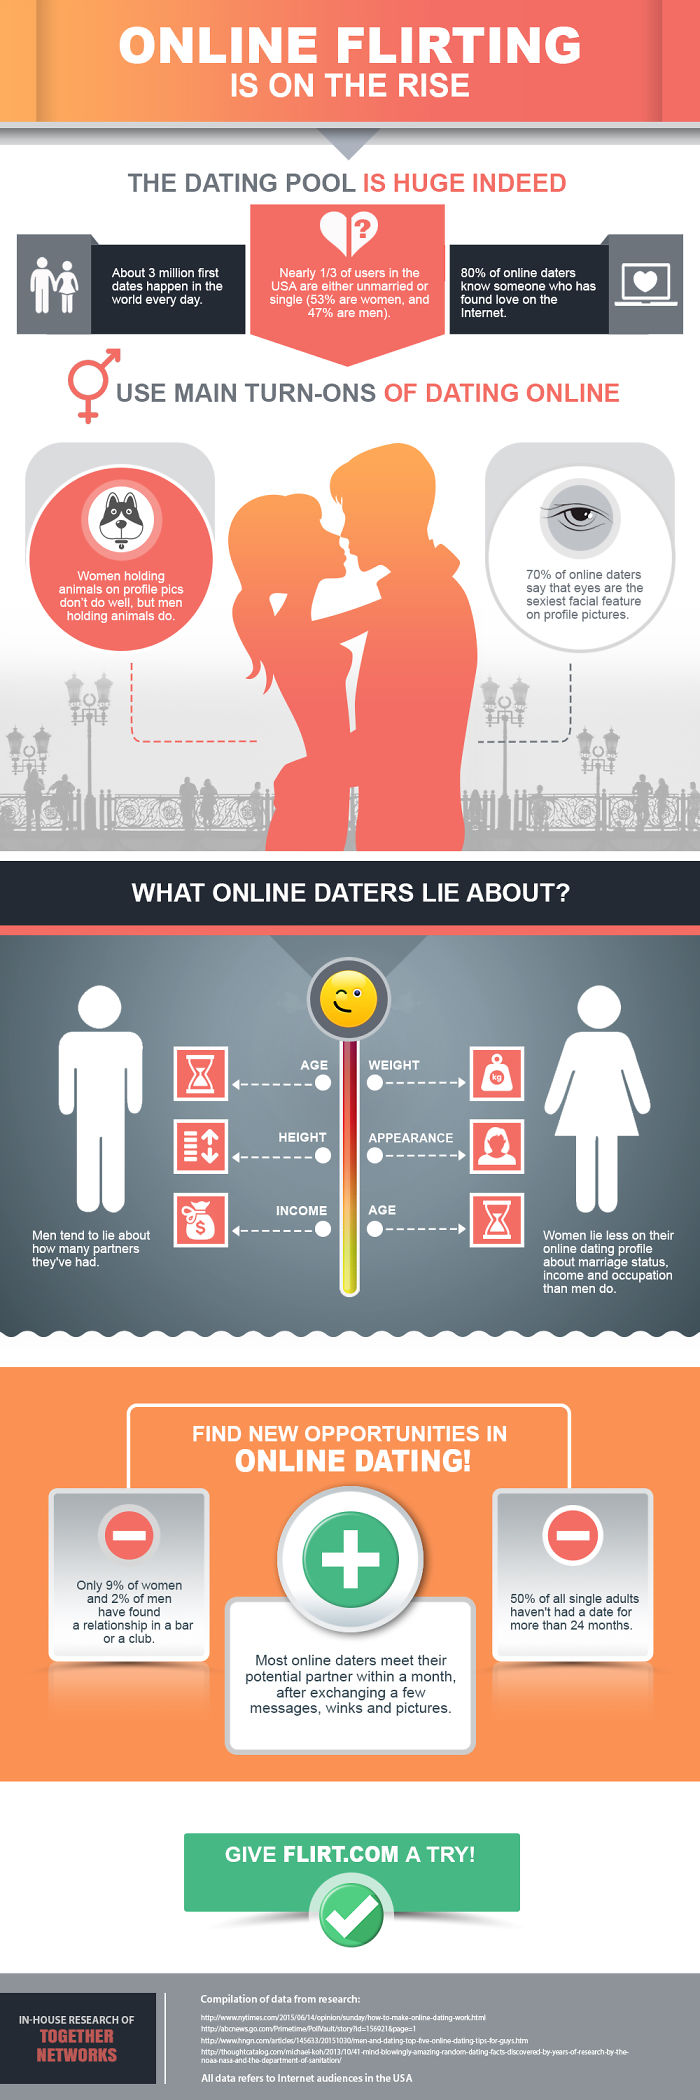 Flirt.com – Review Of Digital Dating By Flirt.com